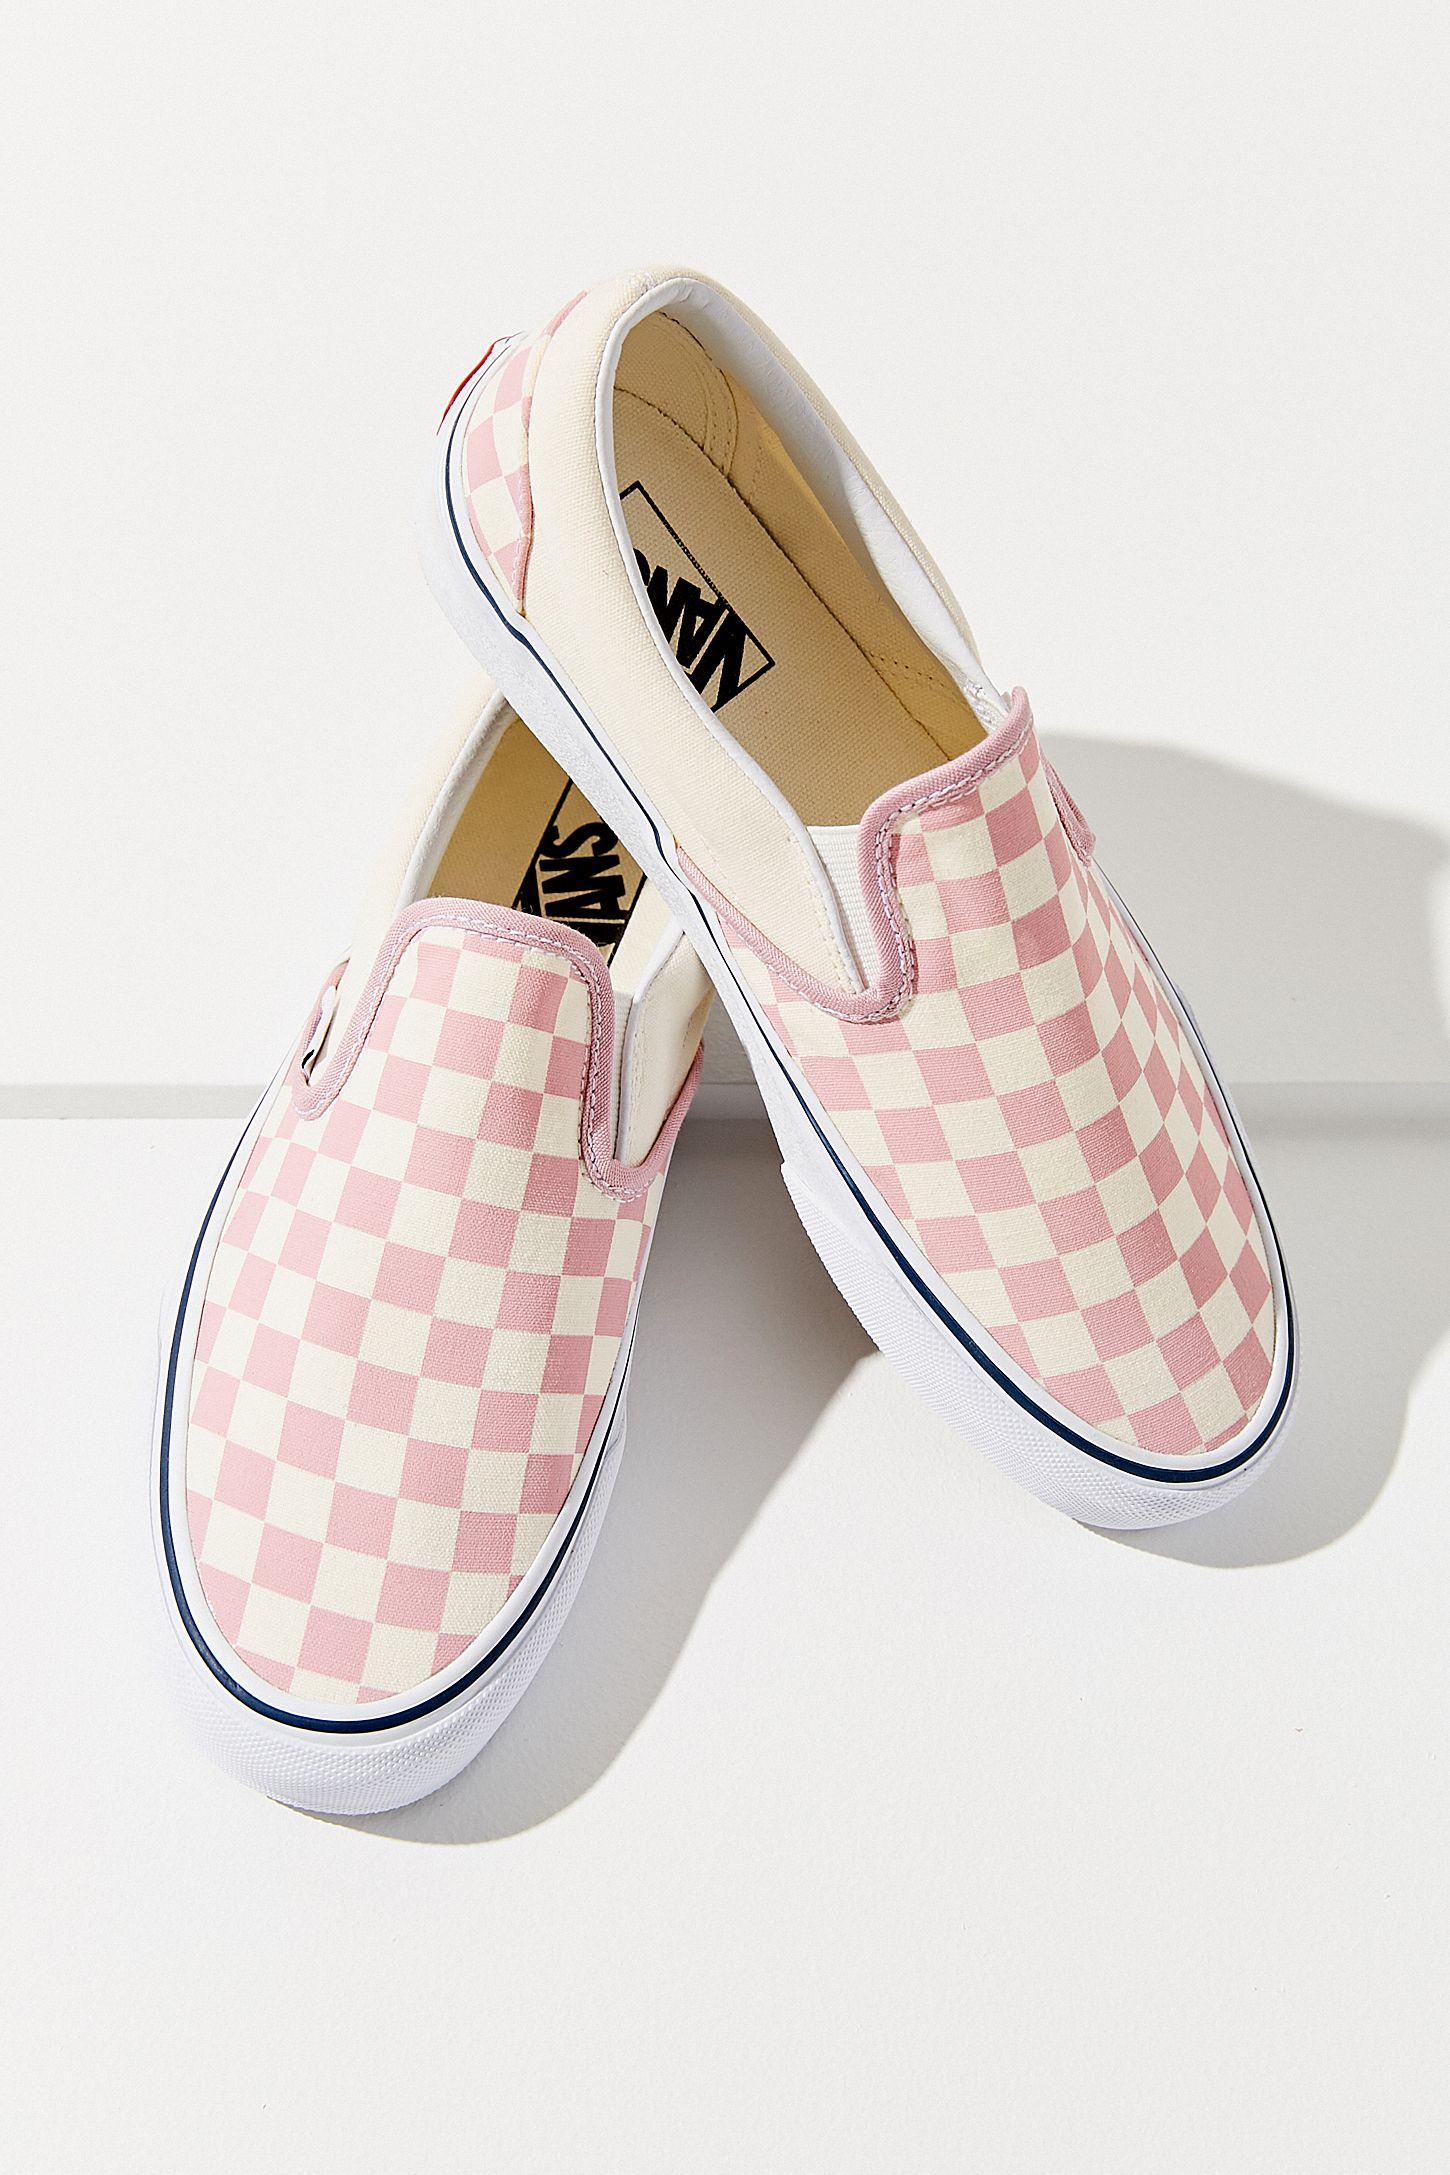 c8672b05e3 Vans Pink Checkerboard Slip-On Sneaker